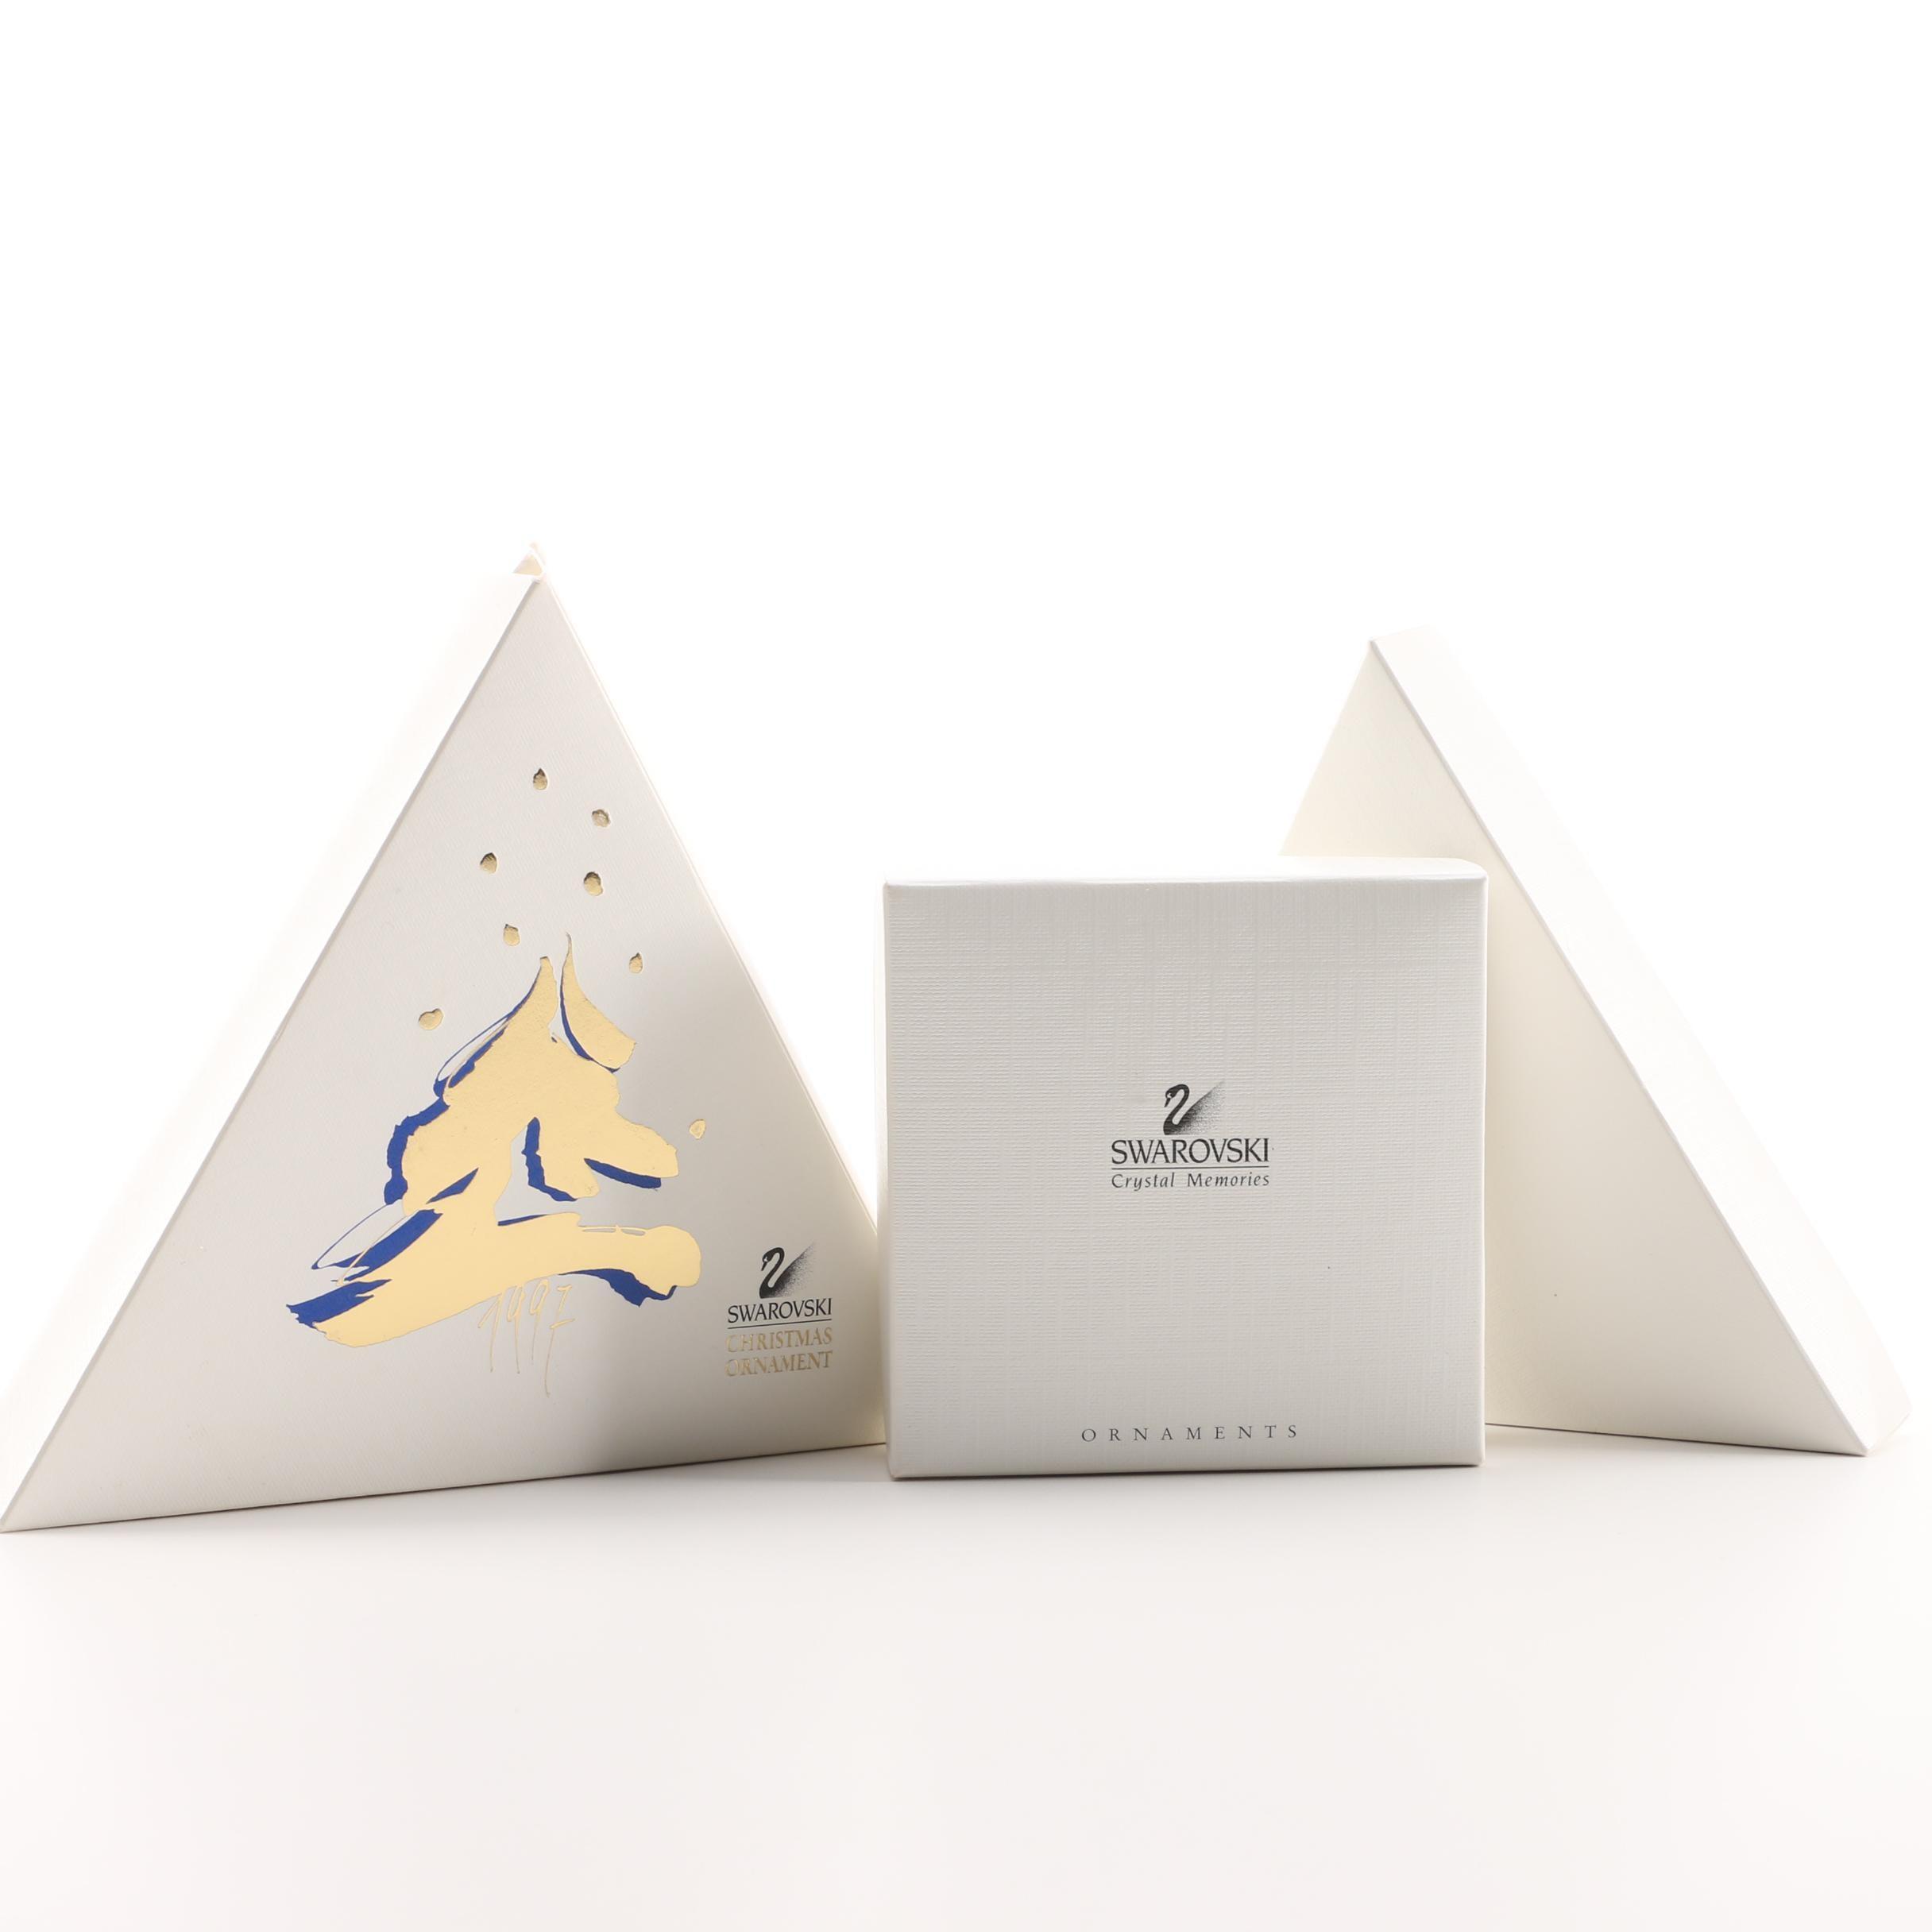 Swarovski Crystal Snowflake Ornaments